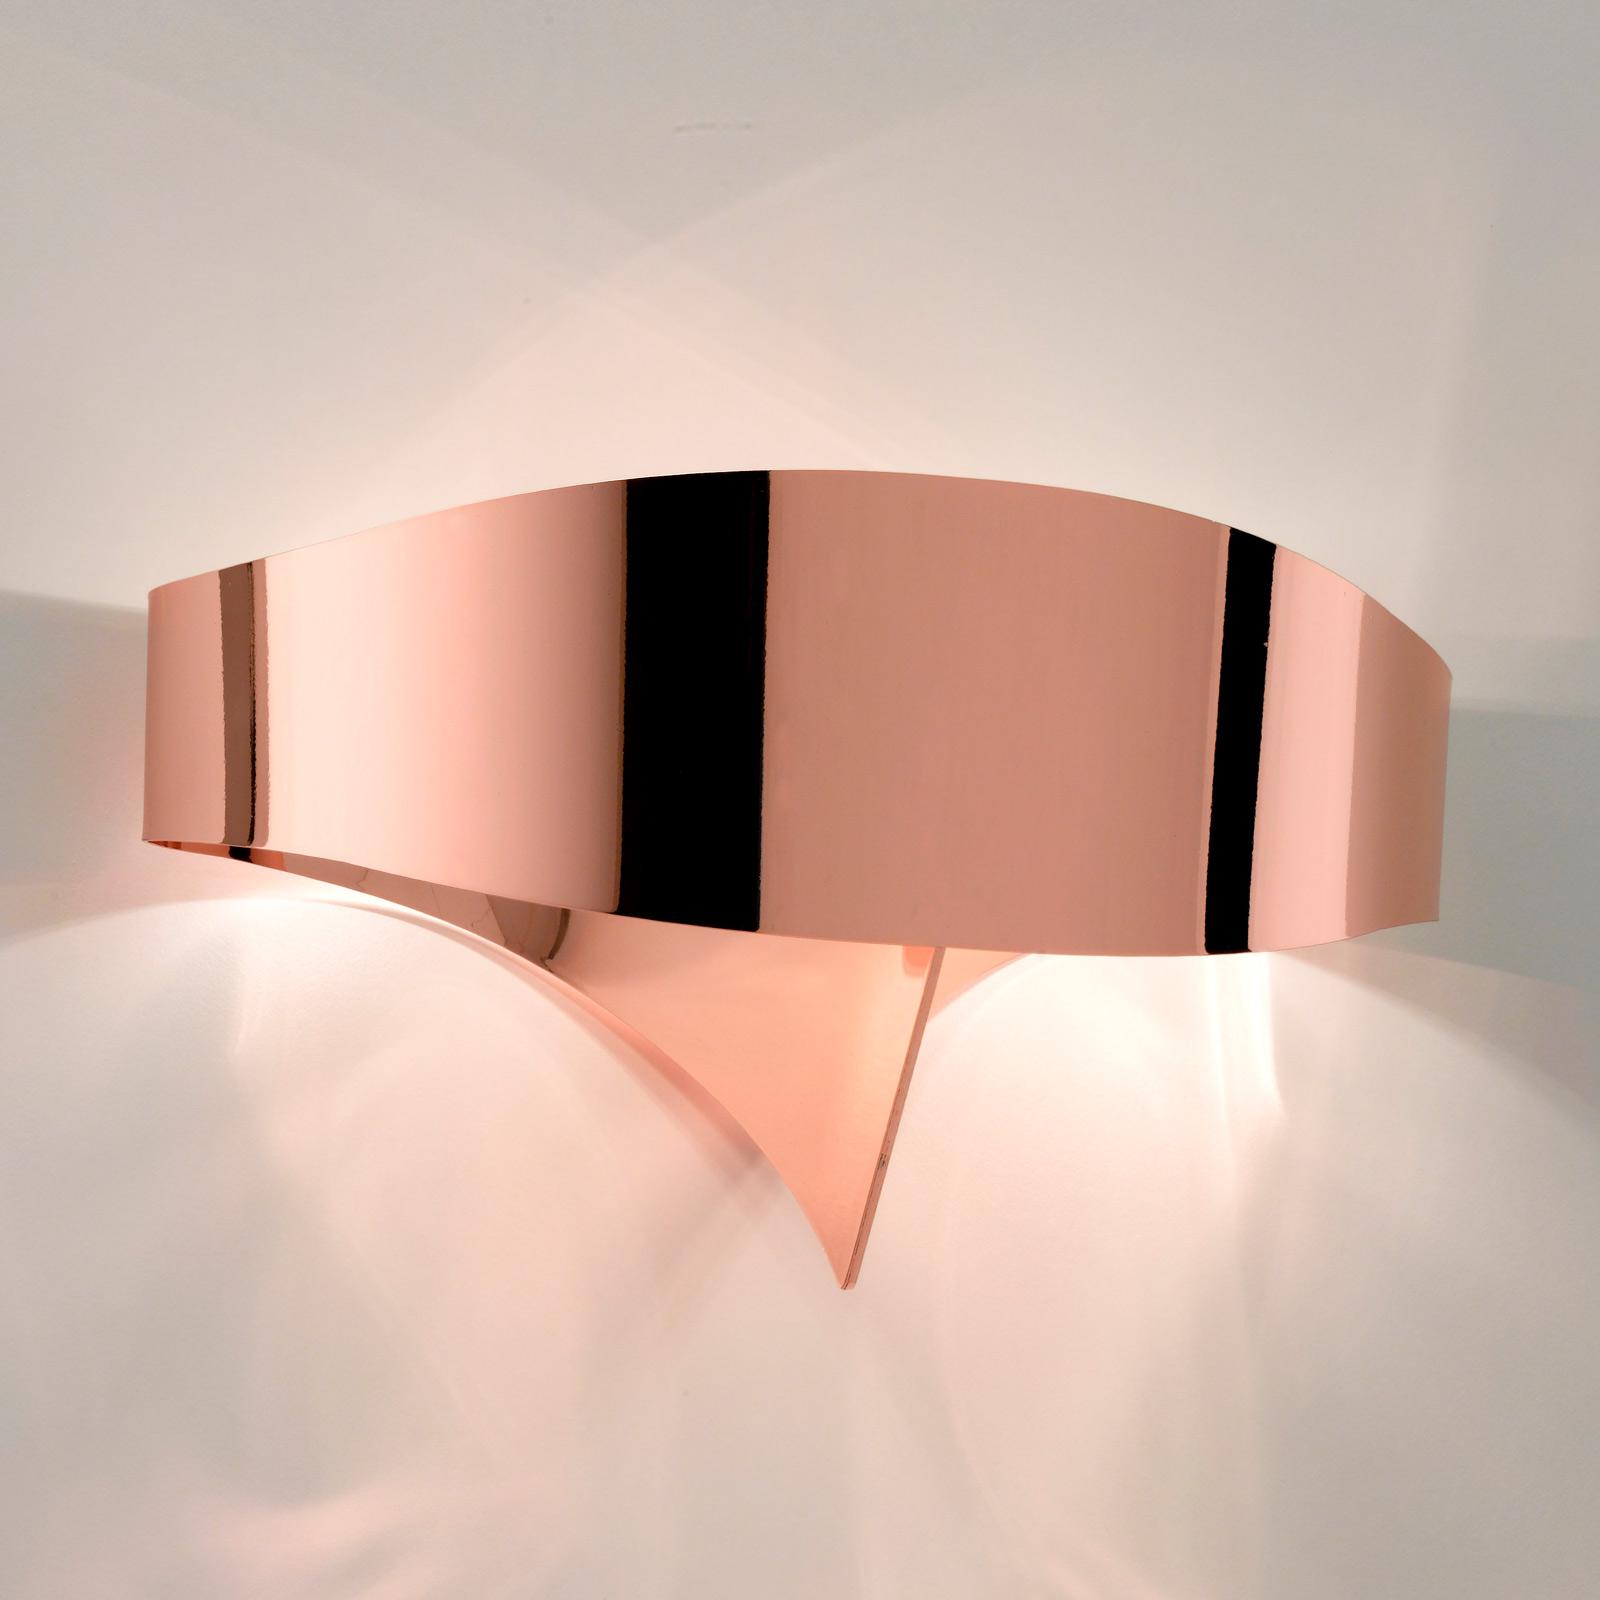 LED-Wandleuchte Scudo aus Stahl, kupfer